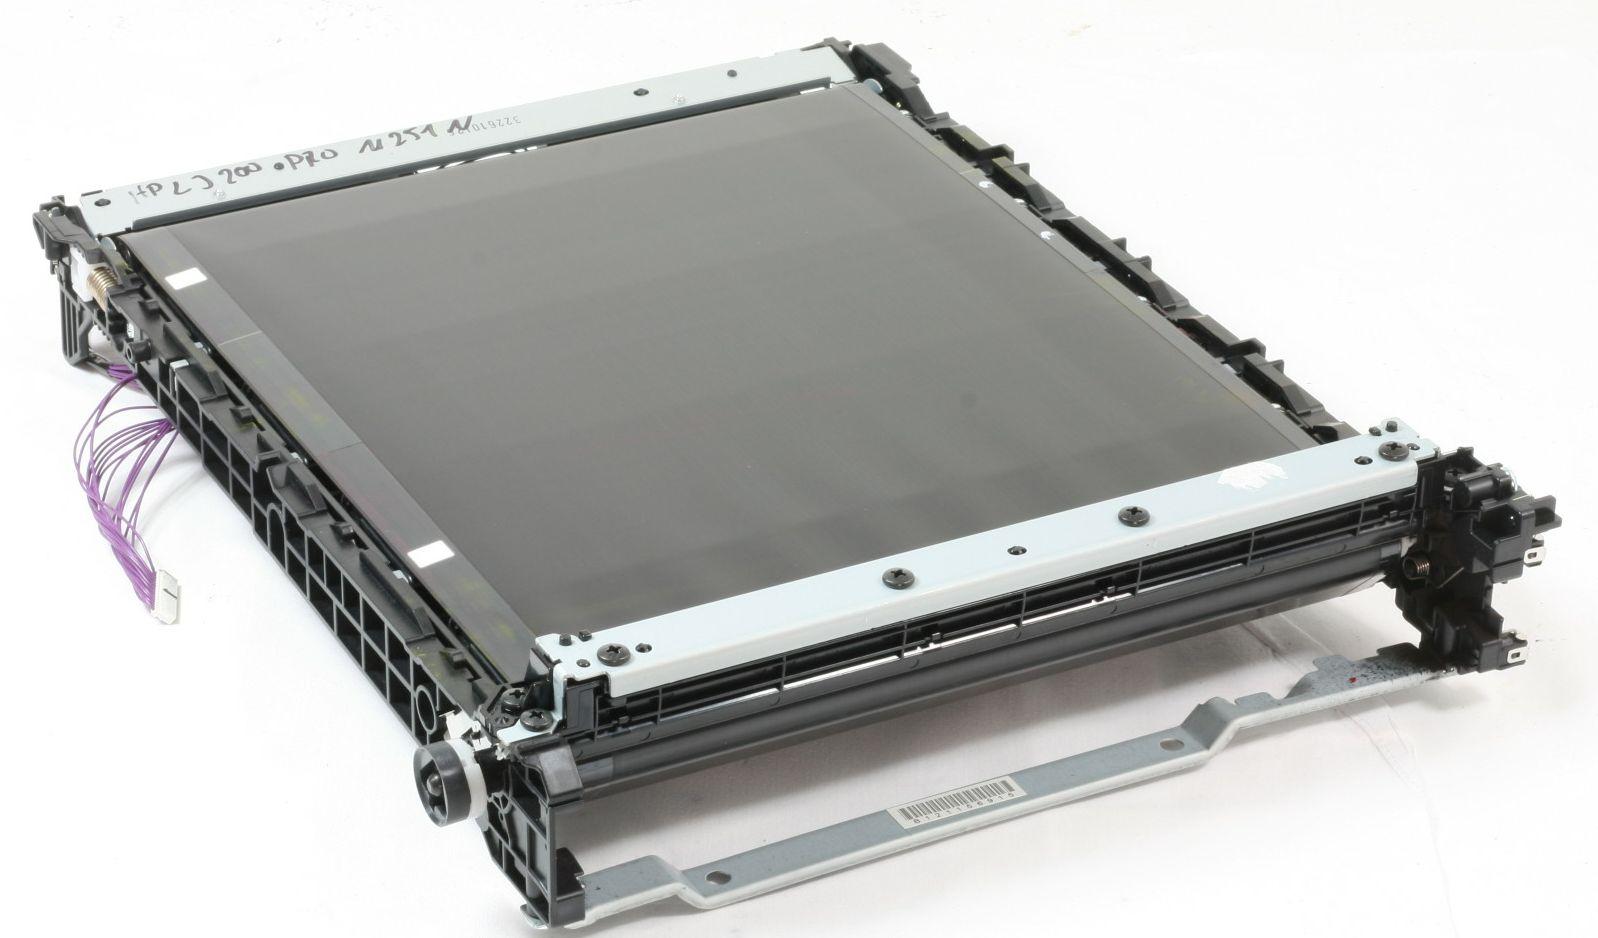 HP RM1 - 8777 Transferband Transfer Belt für LaserJet M251 M276 CP1525 gebrucht